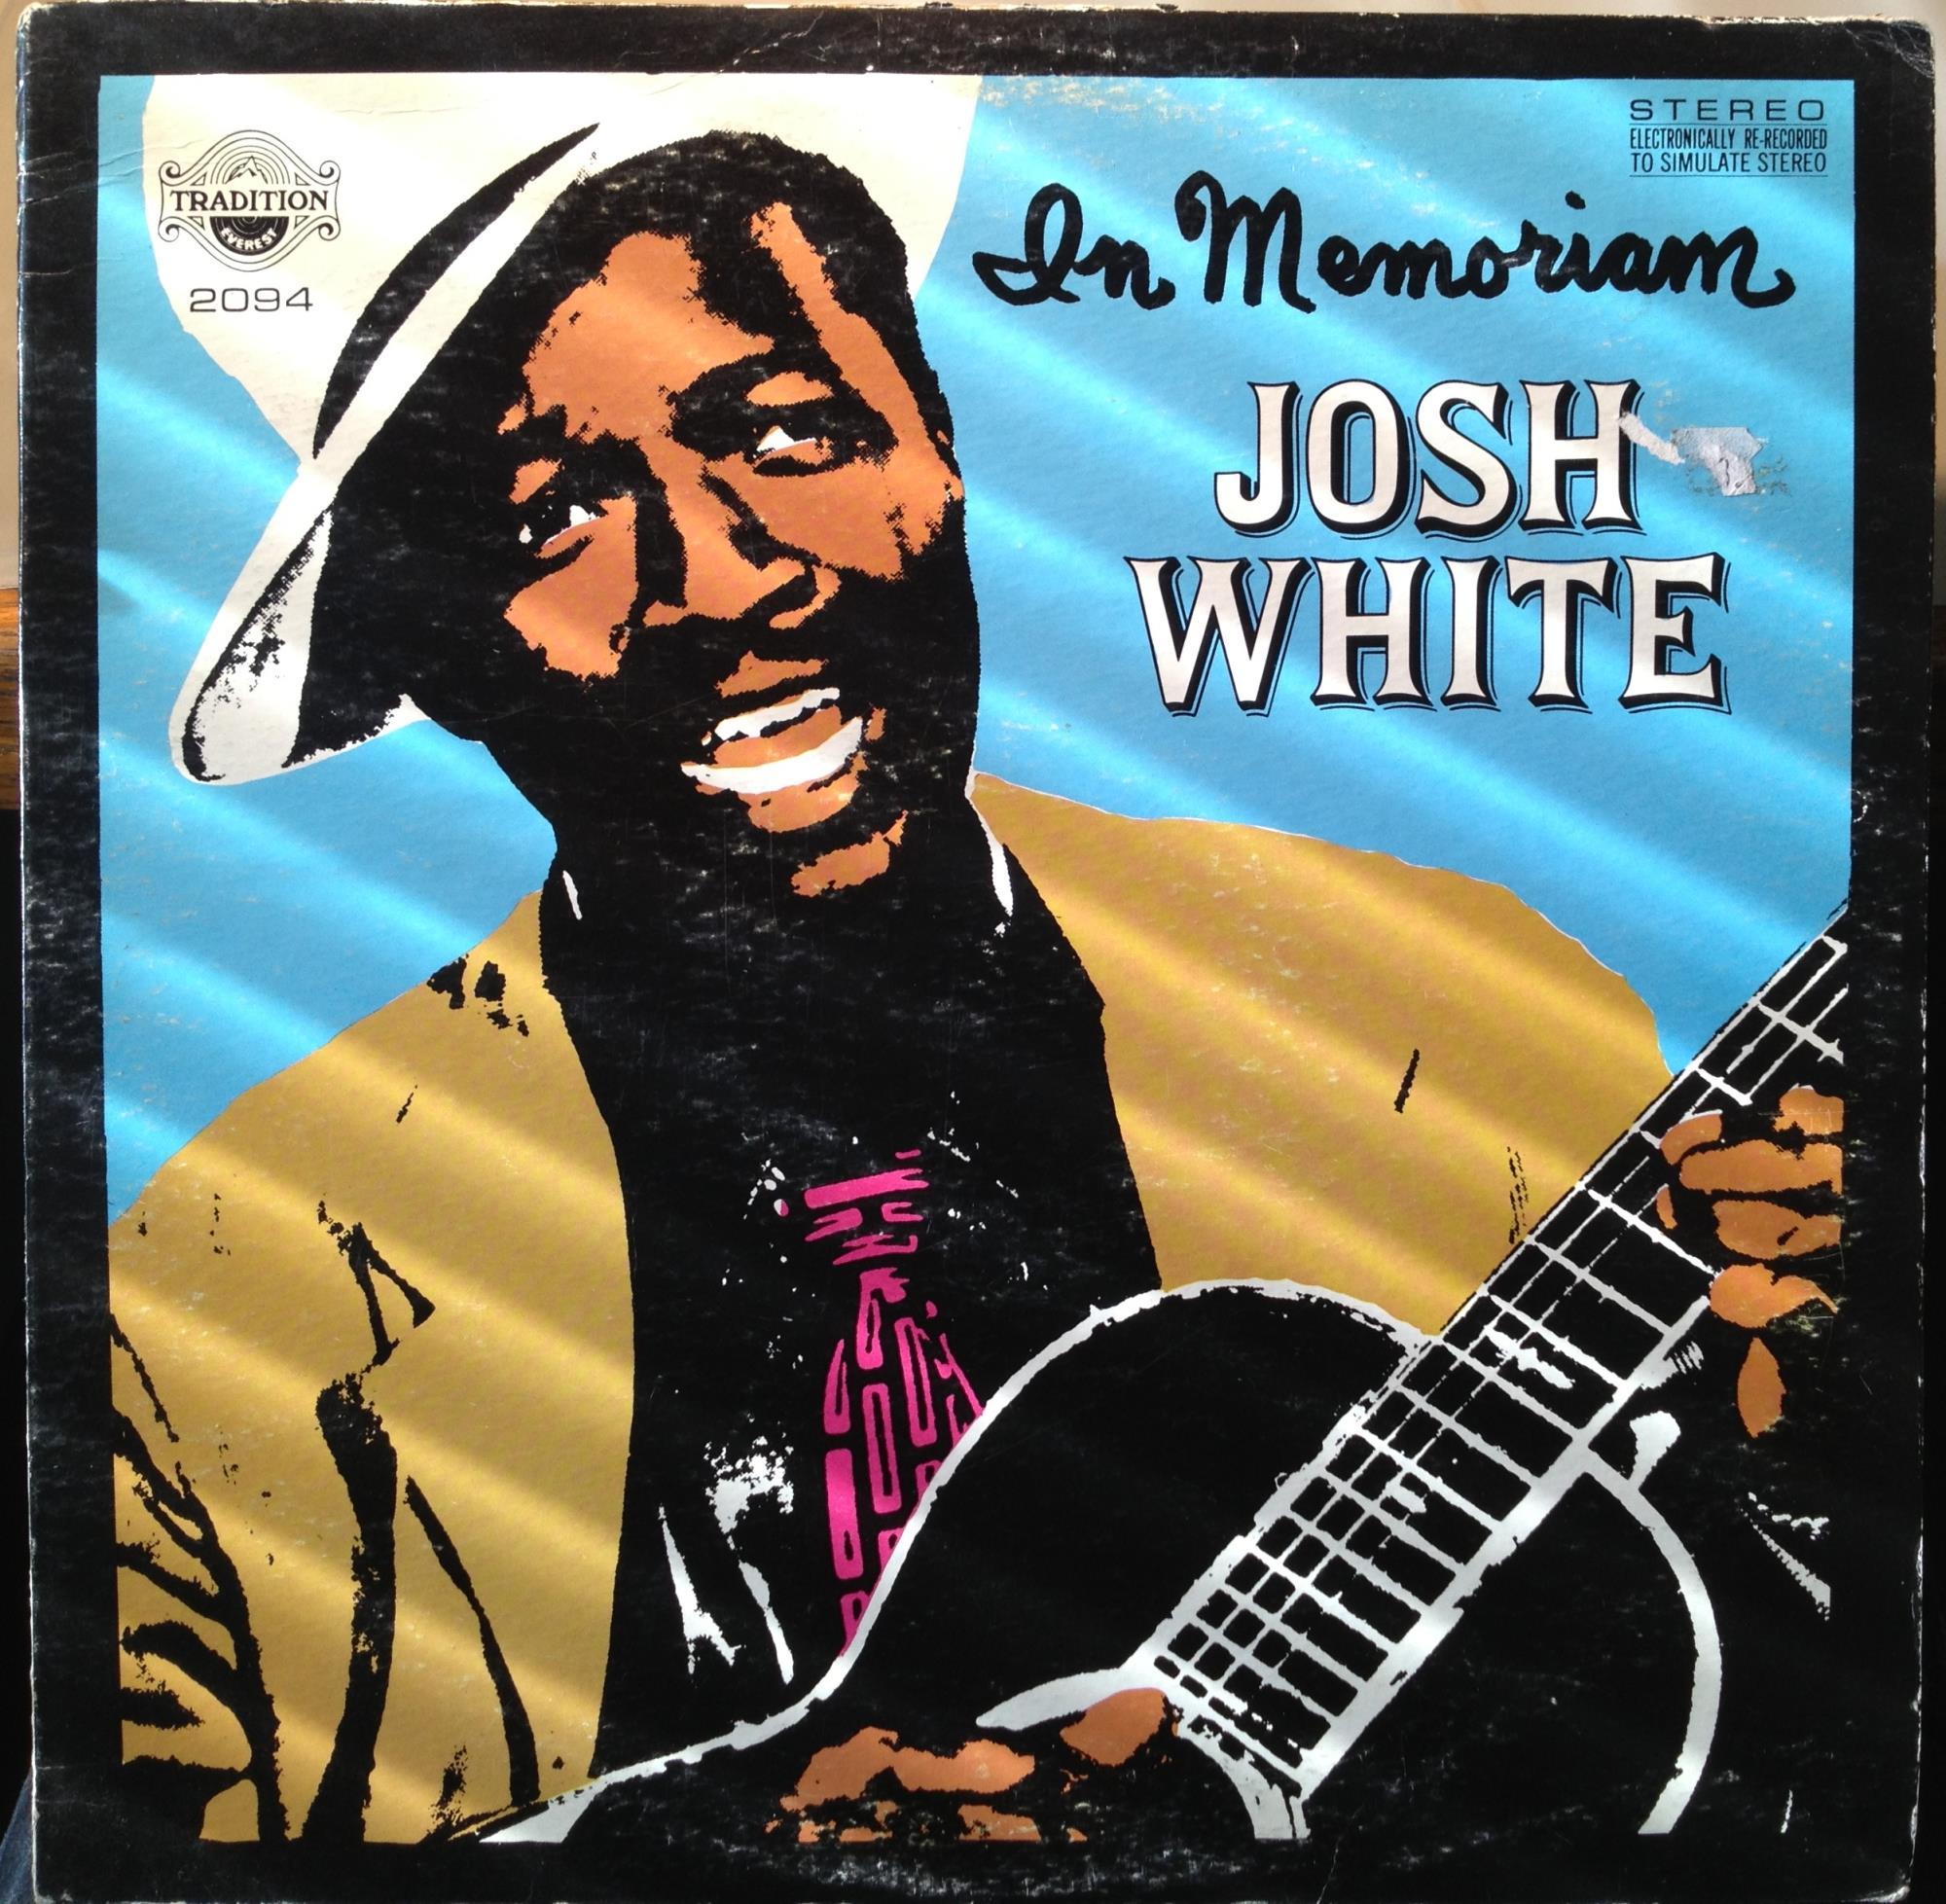 JOSH WHITE - Josh White In Memoriam Lp Vg+ Tr 2094 Vinyl Record (in Memoriam)